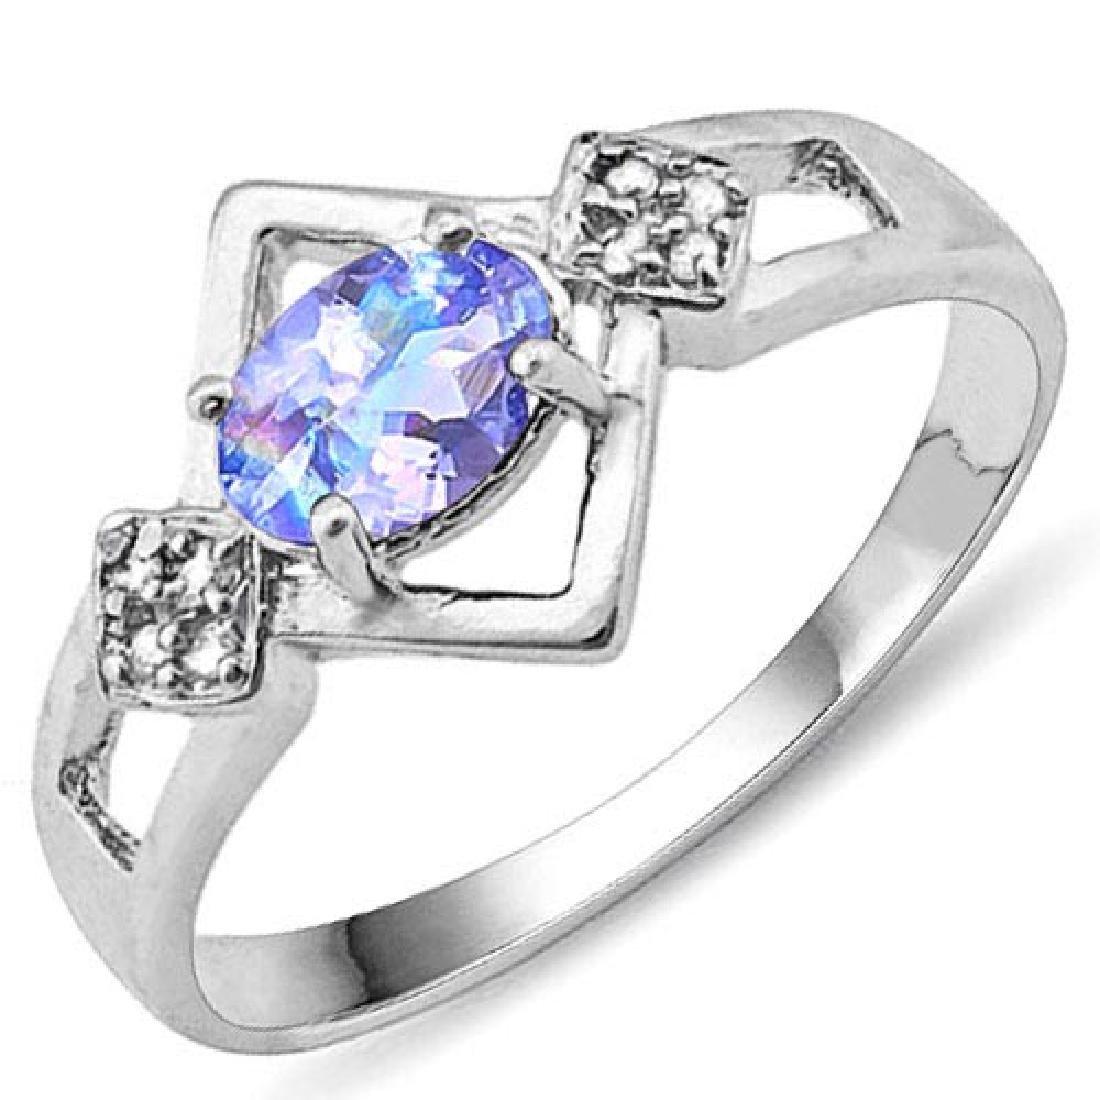 Certified 1.10 Ctw.Genuine Aquamarine And Diamond 14K w